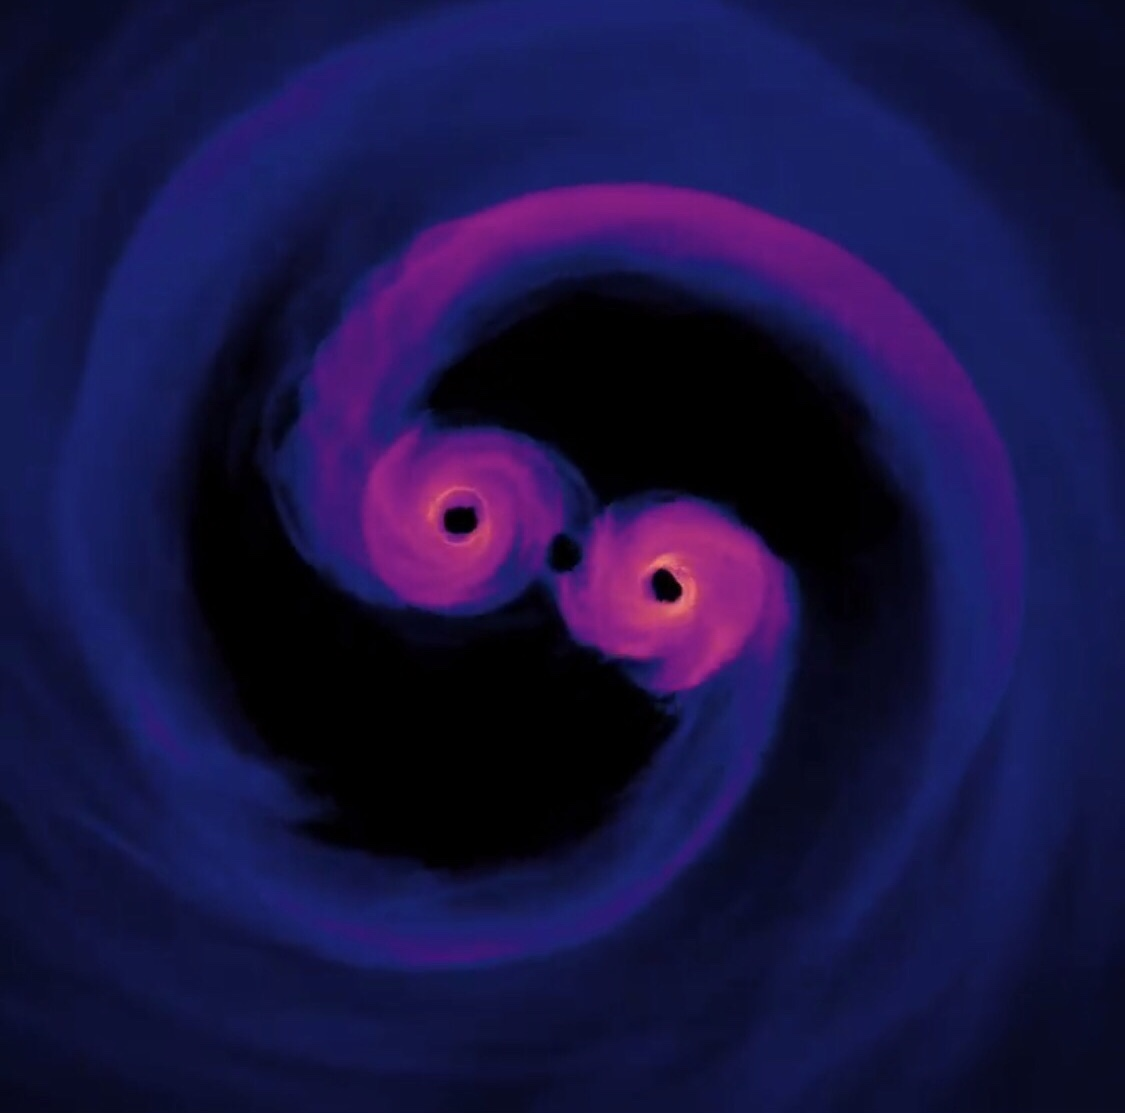 IMAGE: NASA. Computer simulation of two supermassive black holes colliding